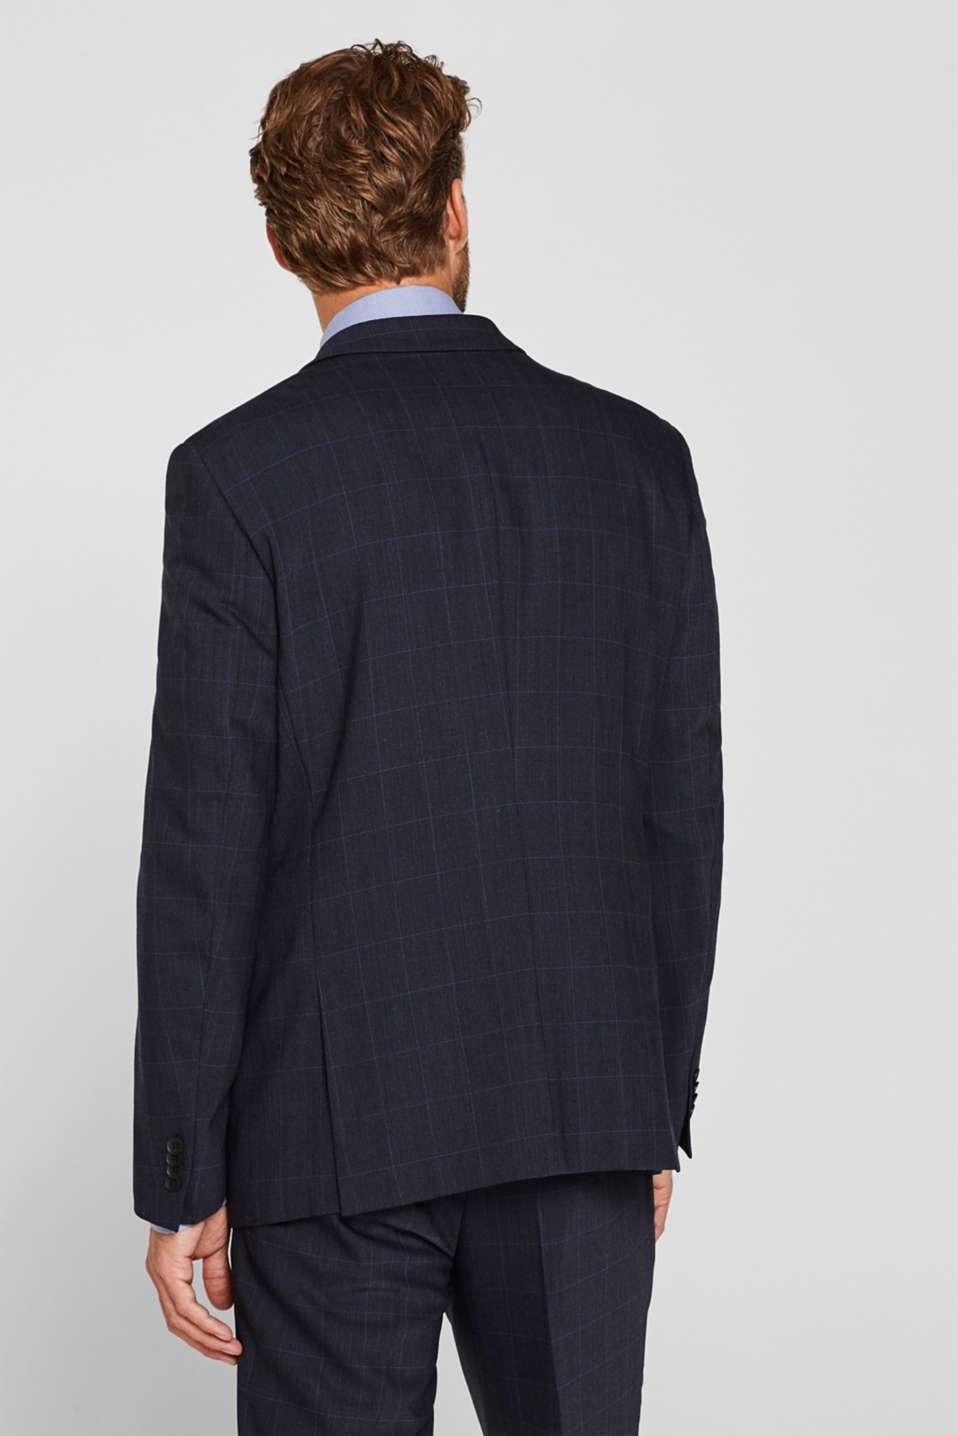 Blazers suit, DARK BLUE, detail image number 3